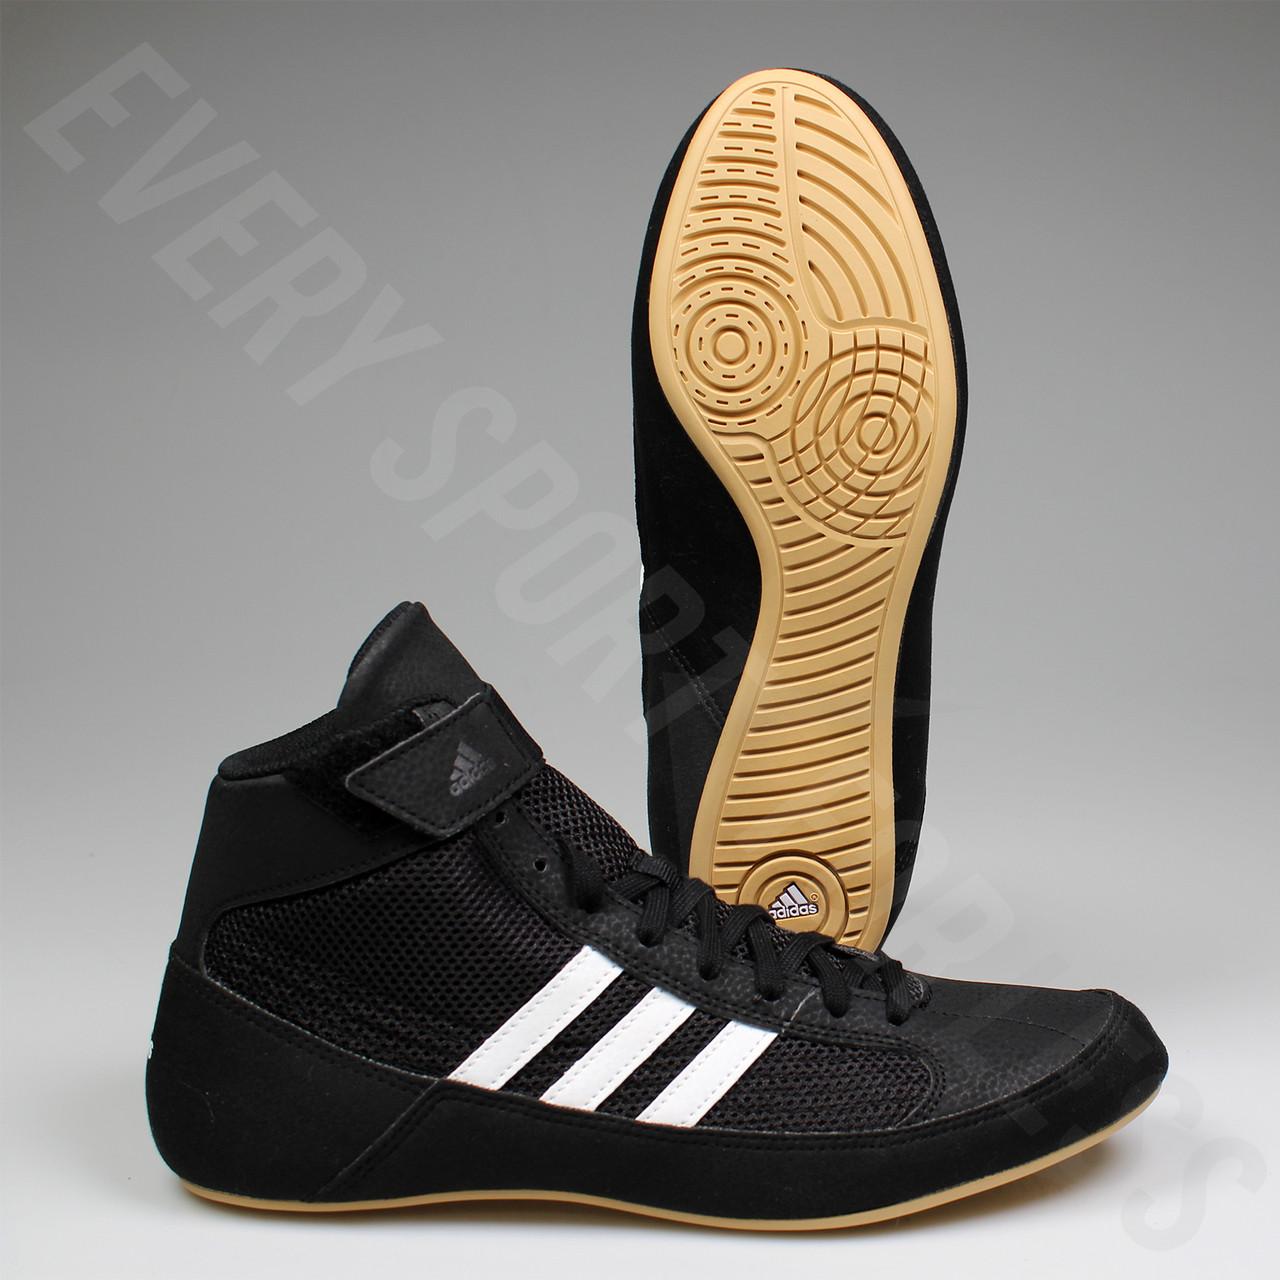 Adidas HVC 2 Youth Wrestling Shoes AQ3327 - Black, White